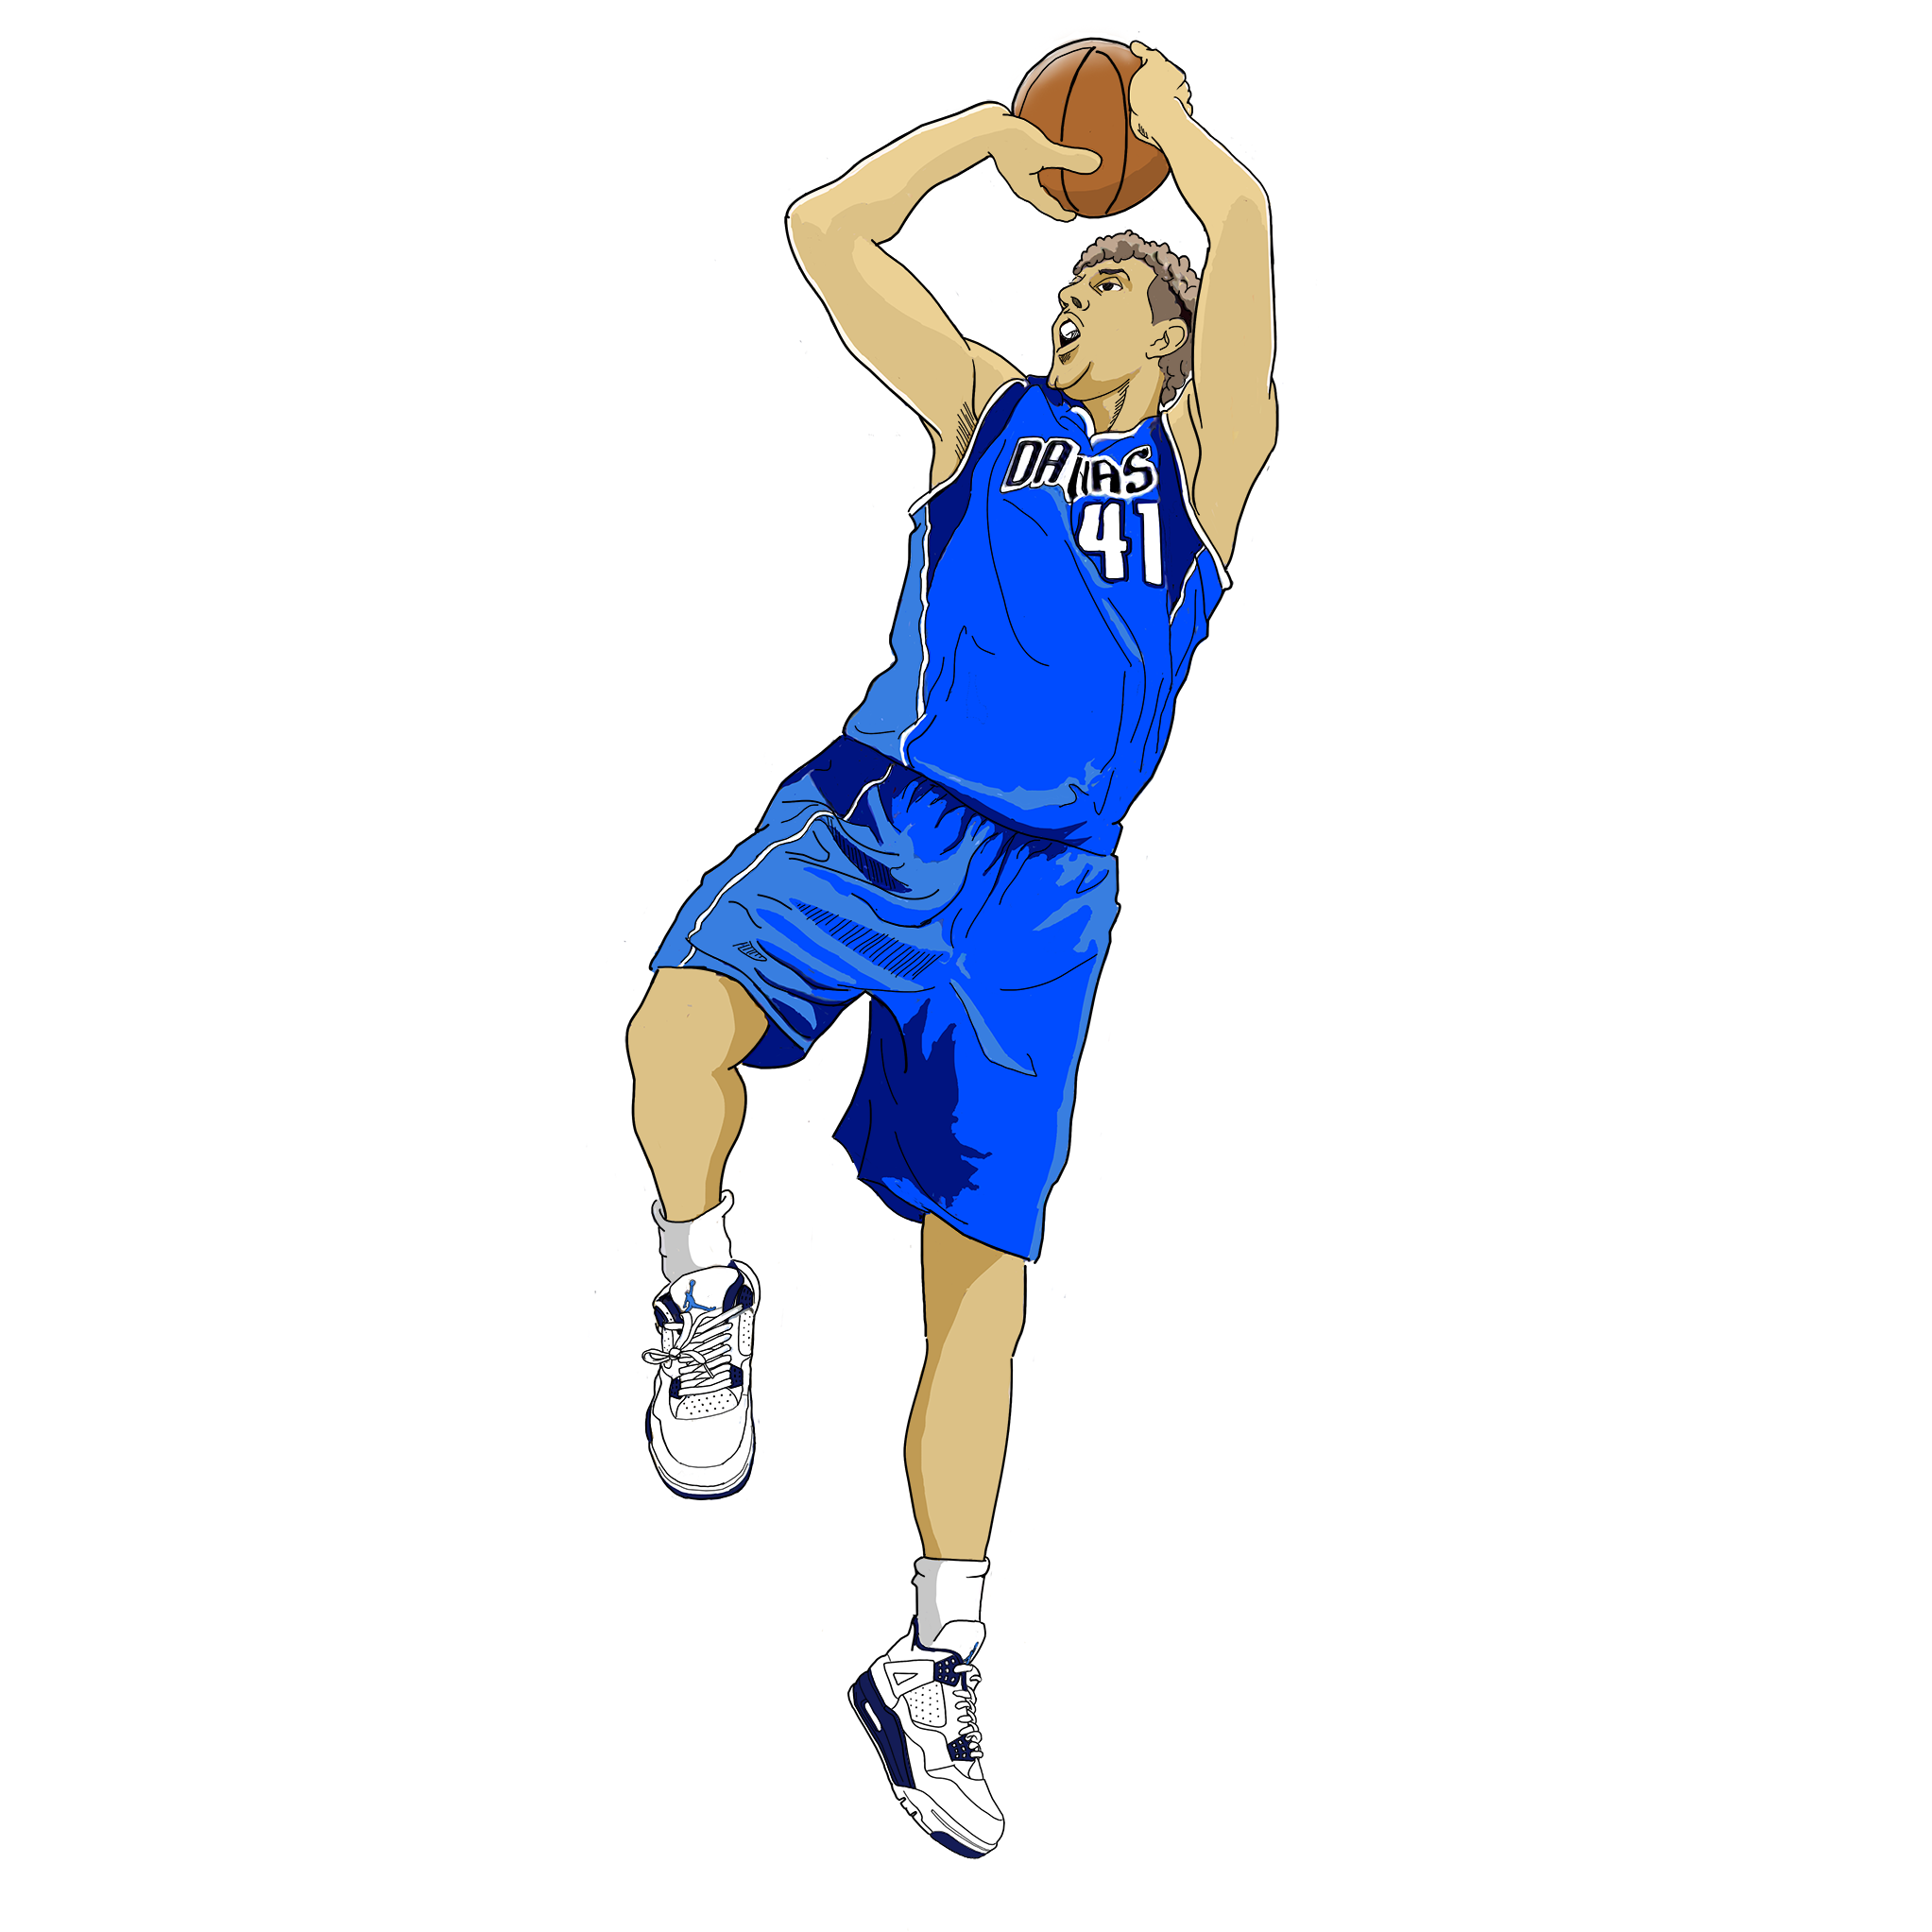 2011 NBA Champion